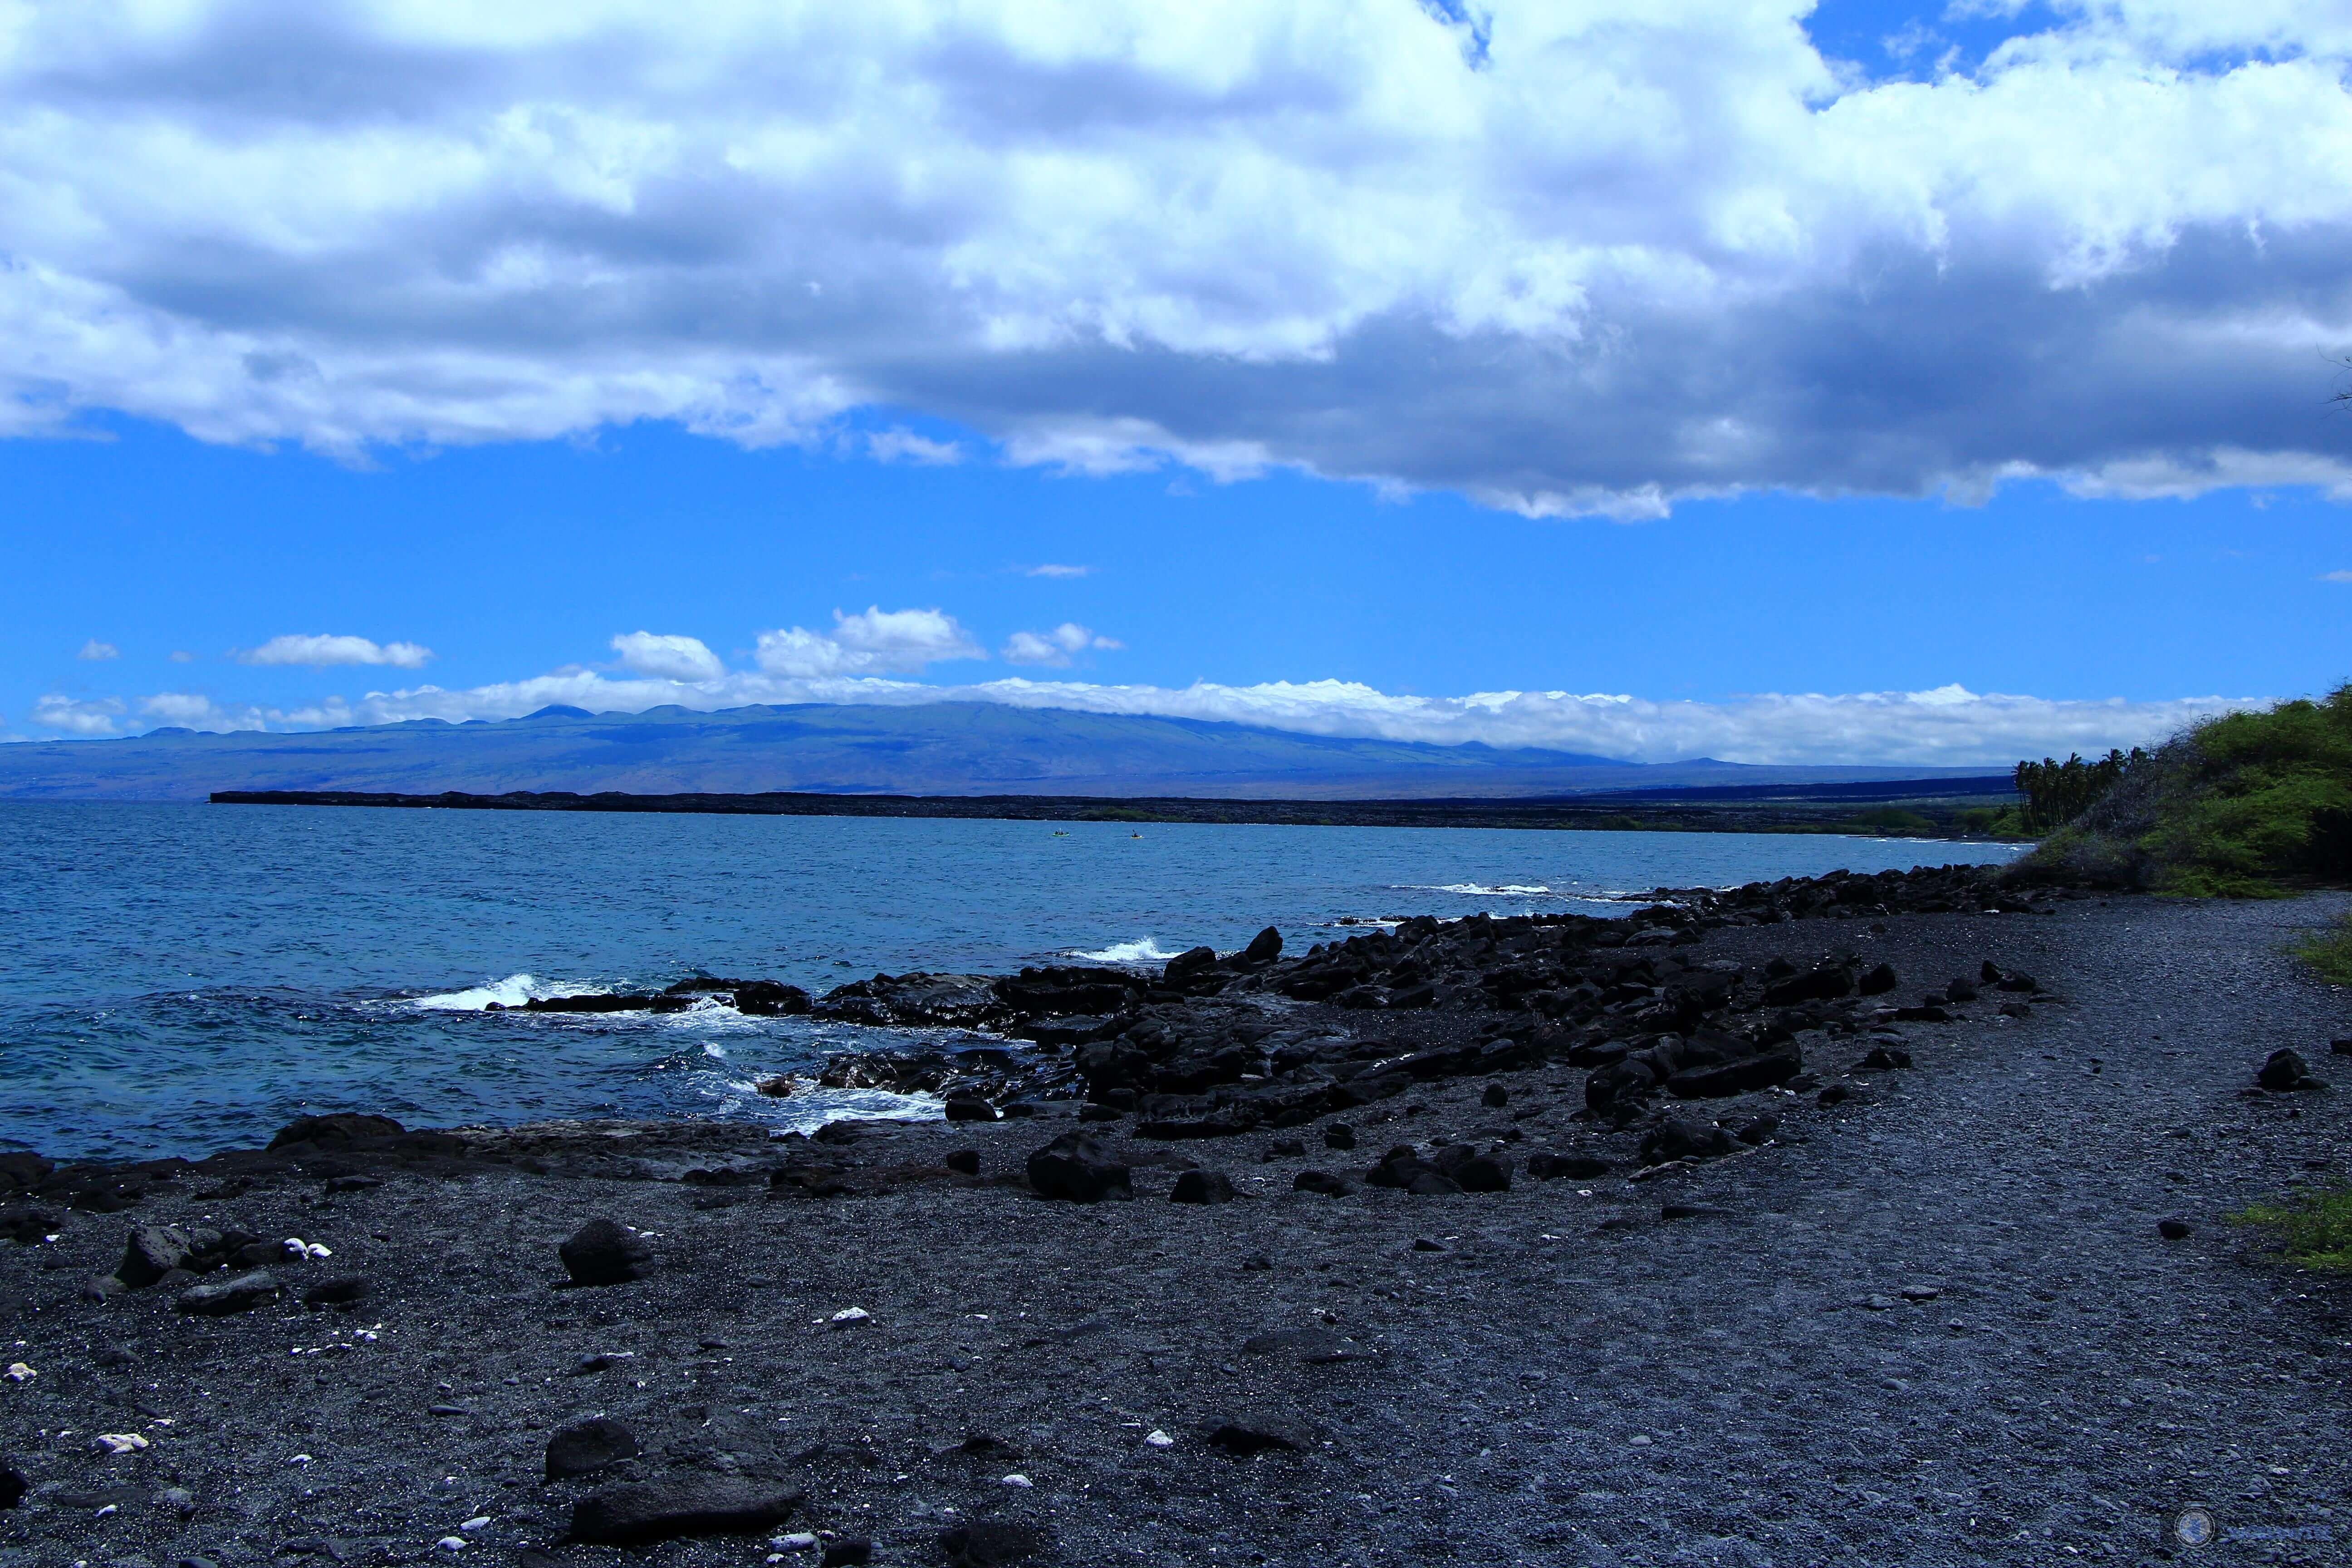 Kiholo Bay, Kona, Island of Hawaii